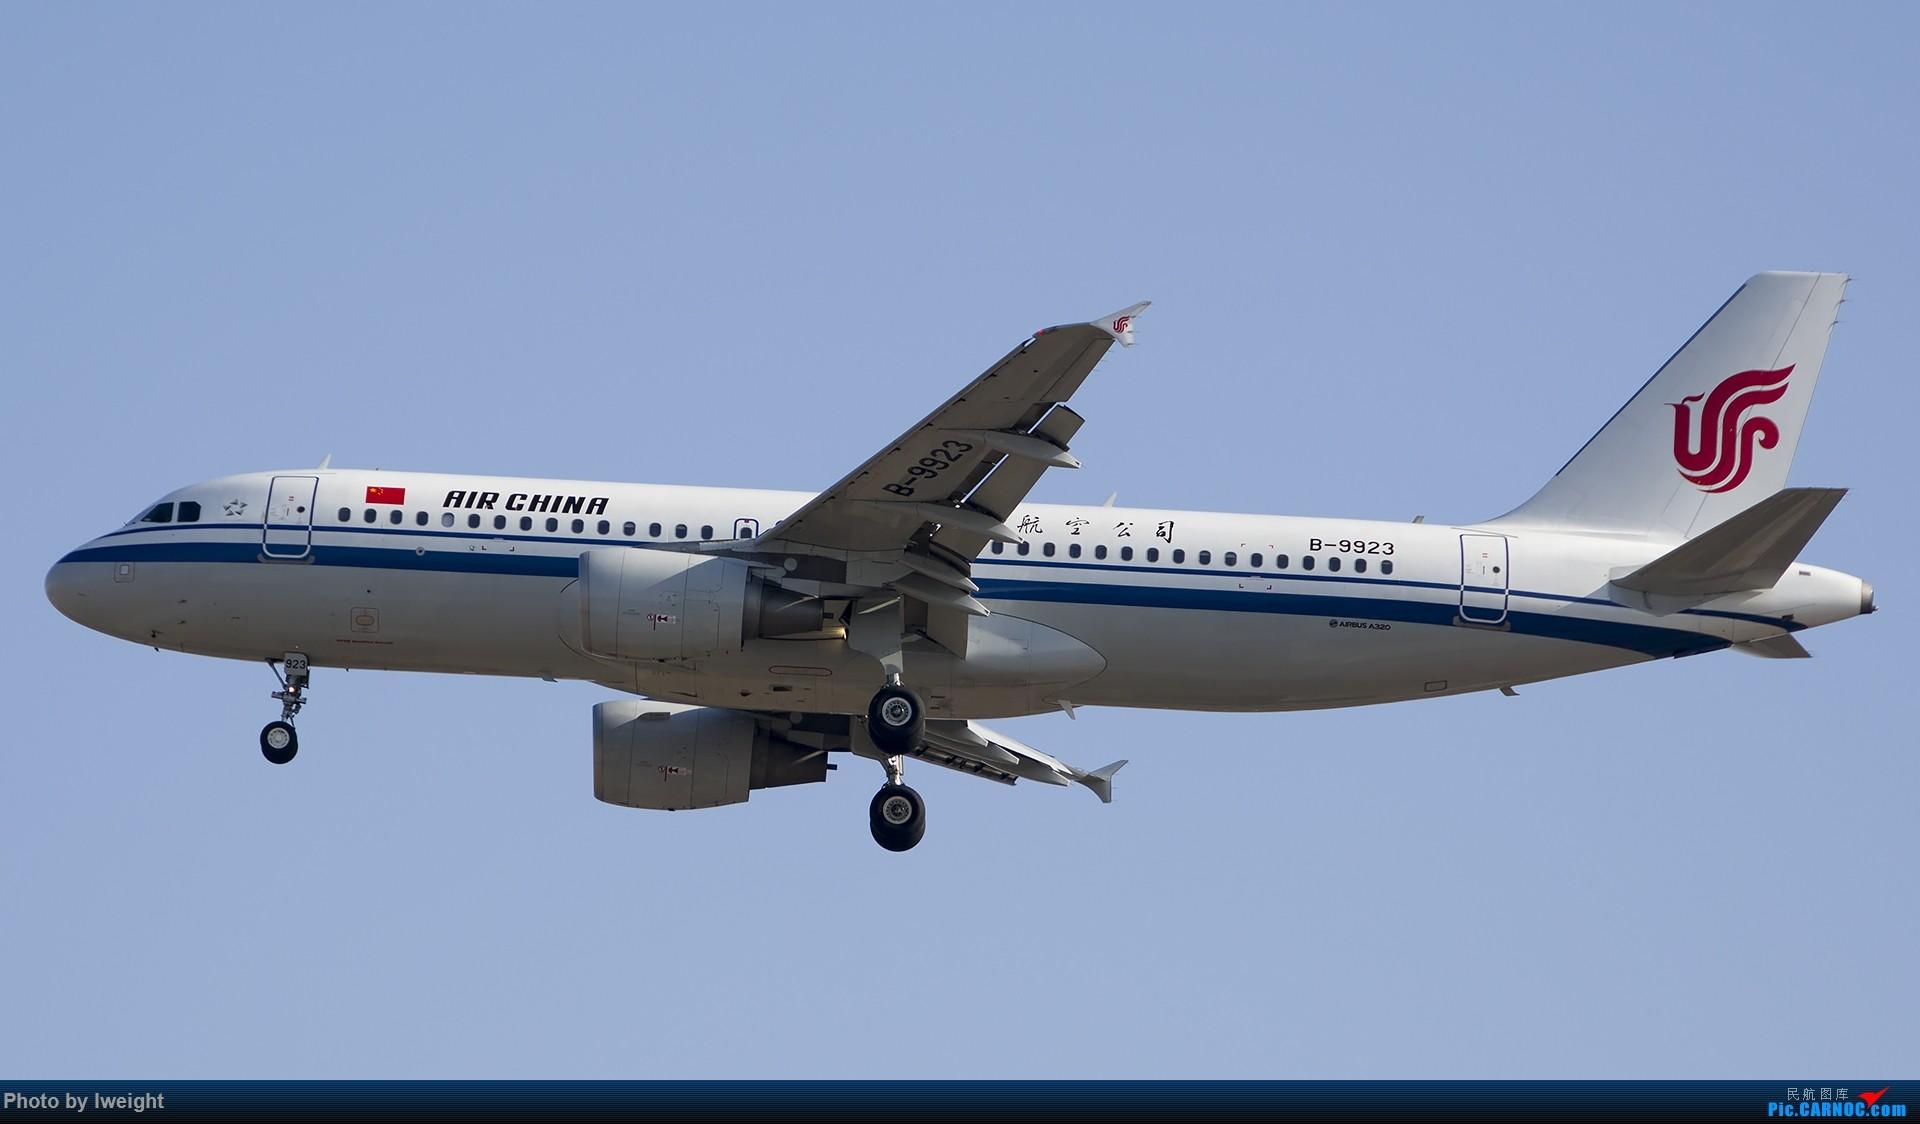 Re:[原创]庆祝升级777,发上今天在首都机场拍的所有飞机【2014-12-14】 AIRBUS A320-200 B-9923 中国北京首都国际机场